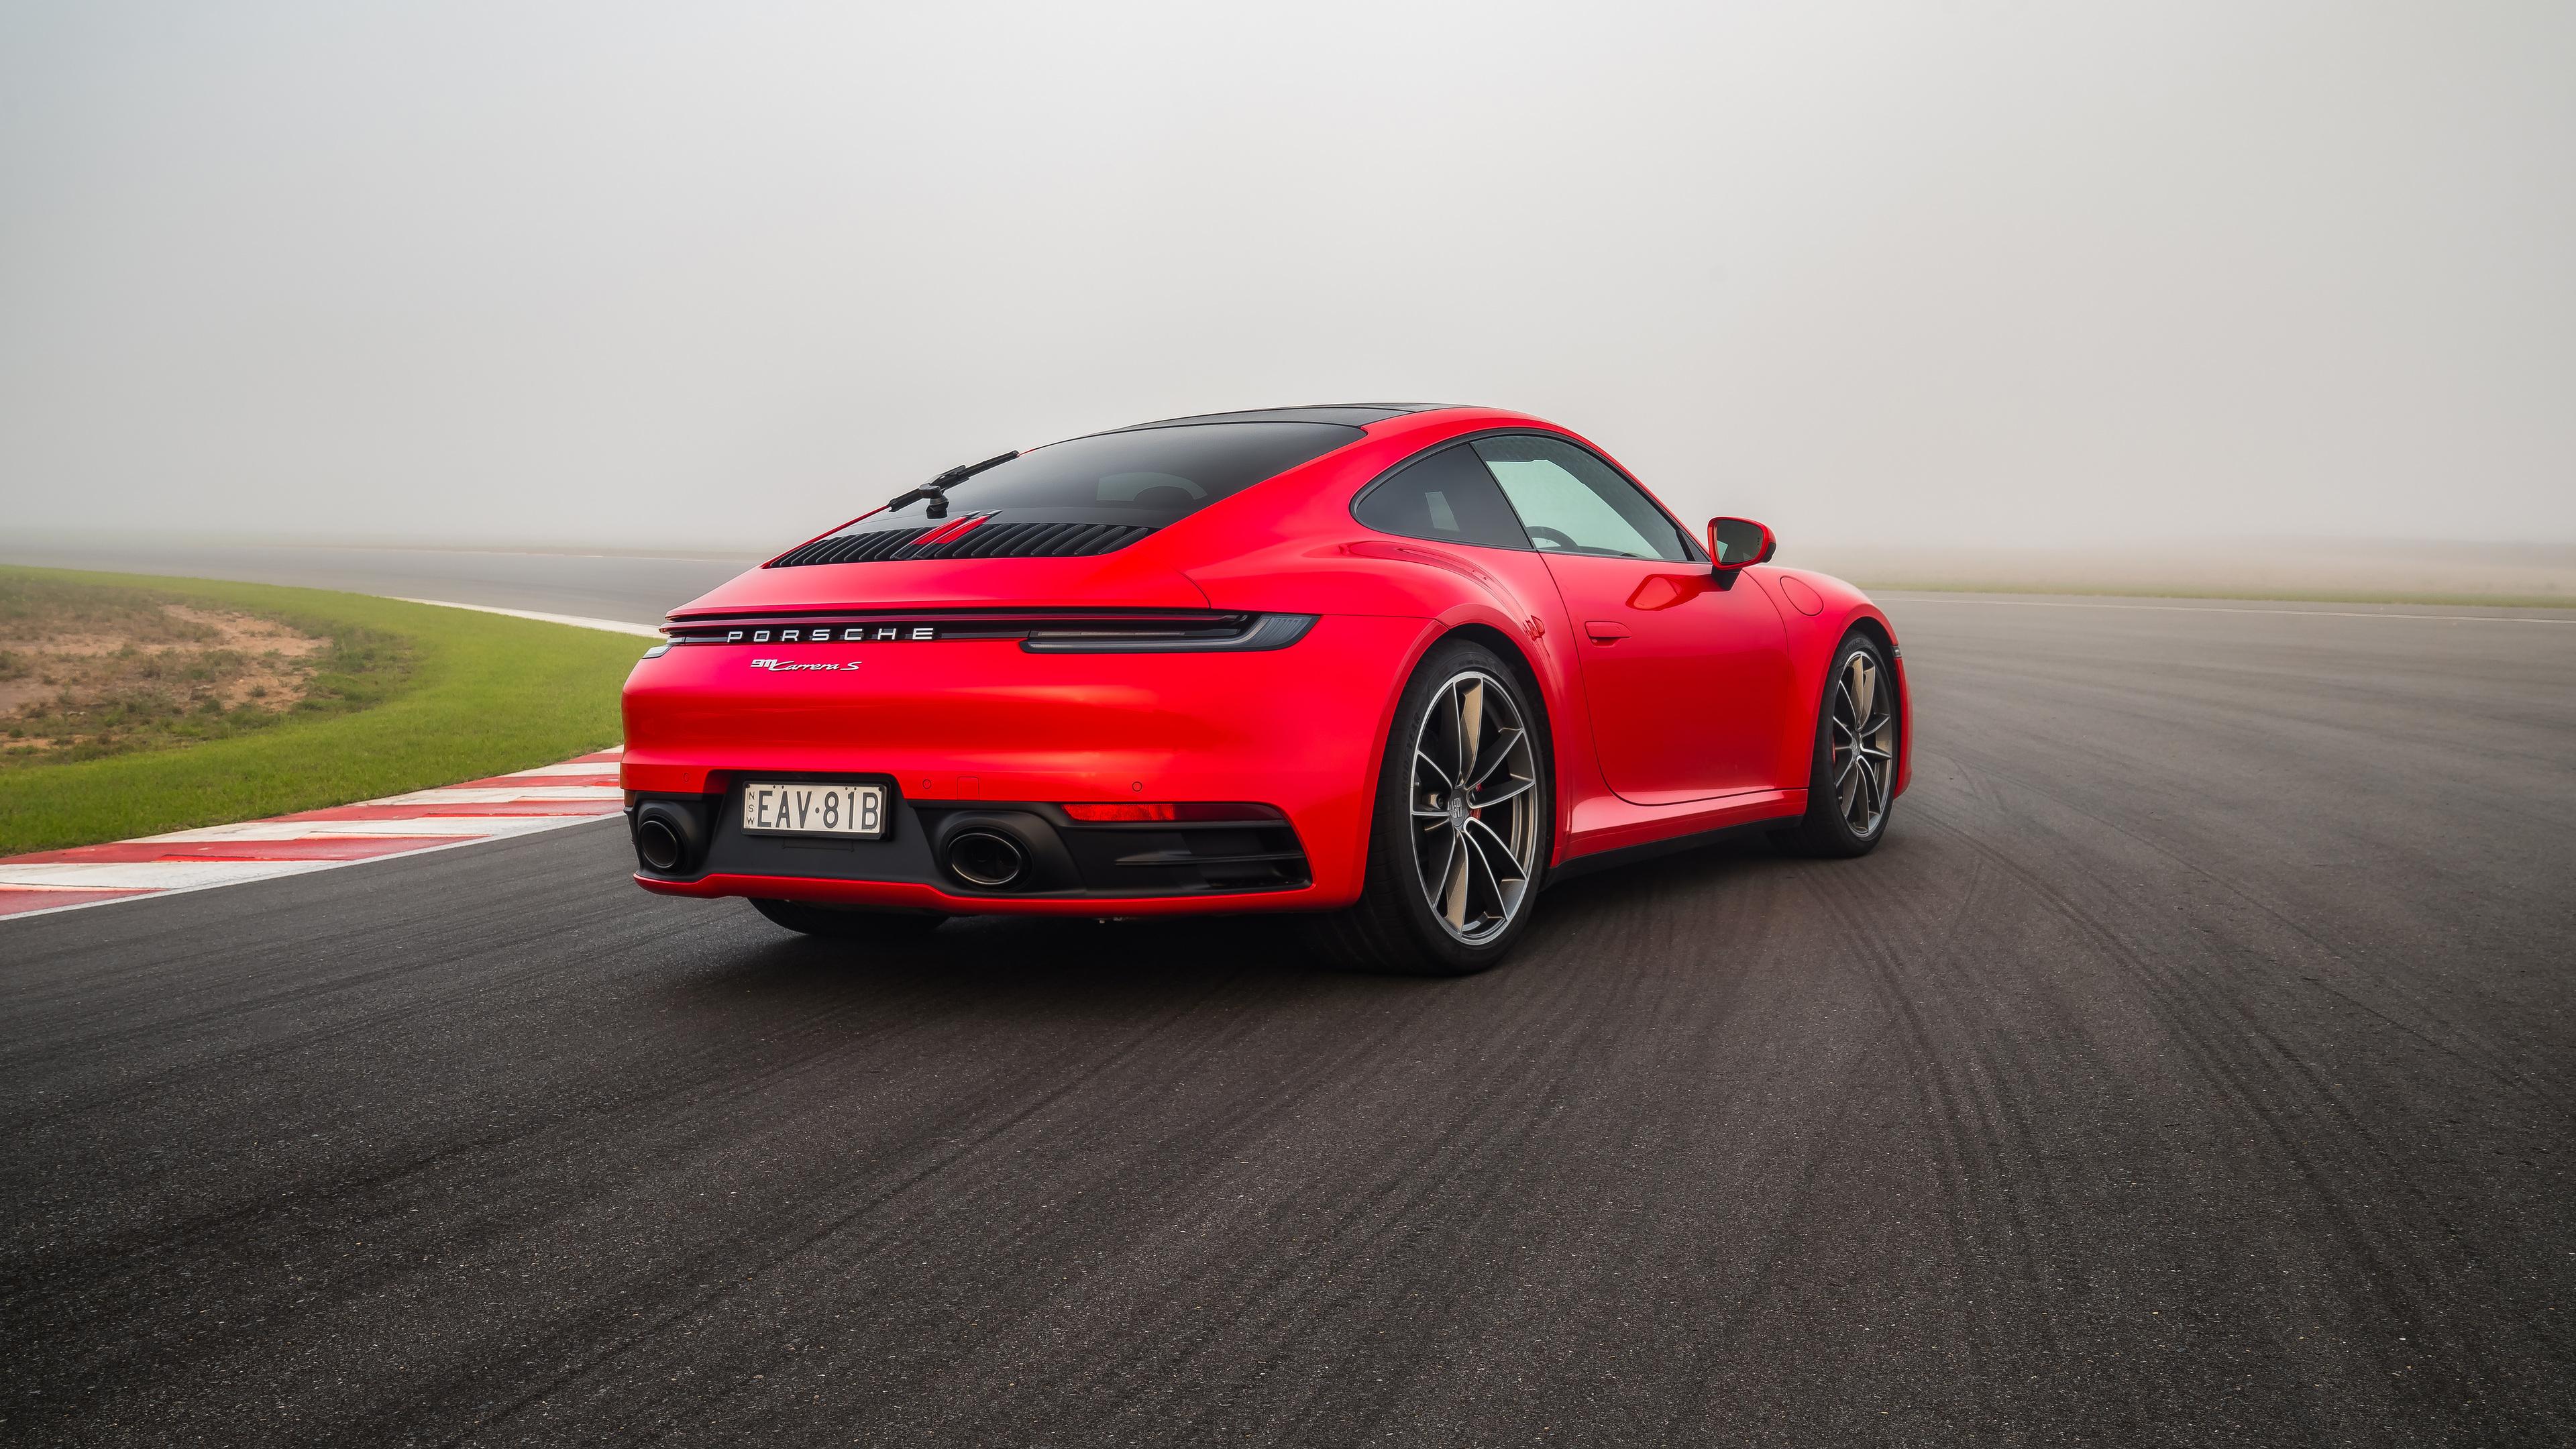 2019 porsche 911 carrera 4k 1554245313 - 2019 Porsche 911 Carrera 4k - porsche wallpapers, porsche 911 wallpapers, hd-wallpapers, cars wallpapers, 5k wallpapers, 4k-wallpapers, 2019 cars wallpapers